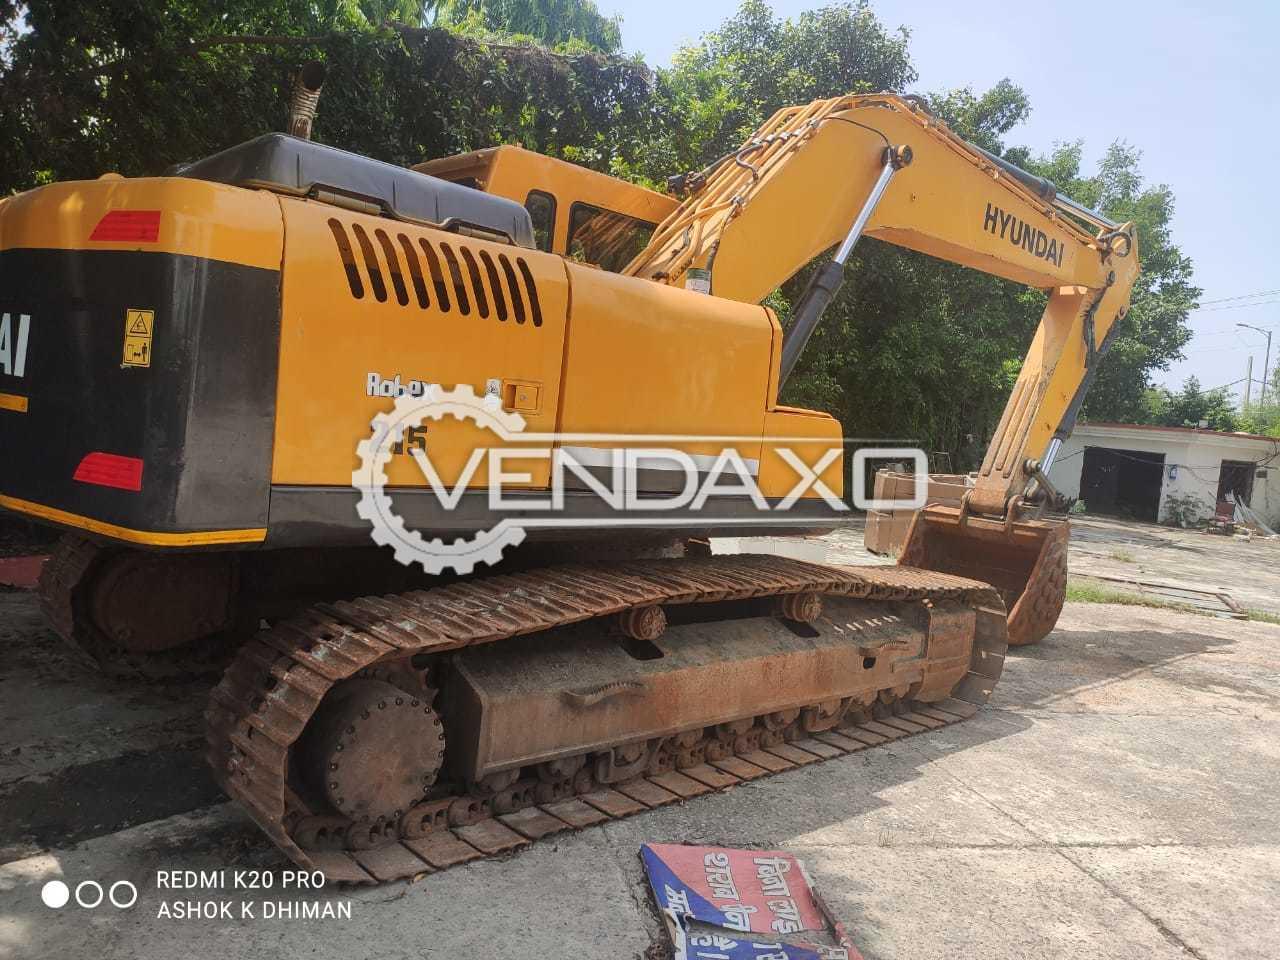 Hyundai 215 Robex Excavators - Power - 140 HP, 2018 Model